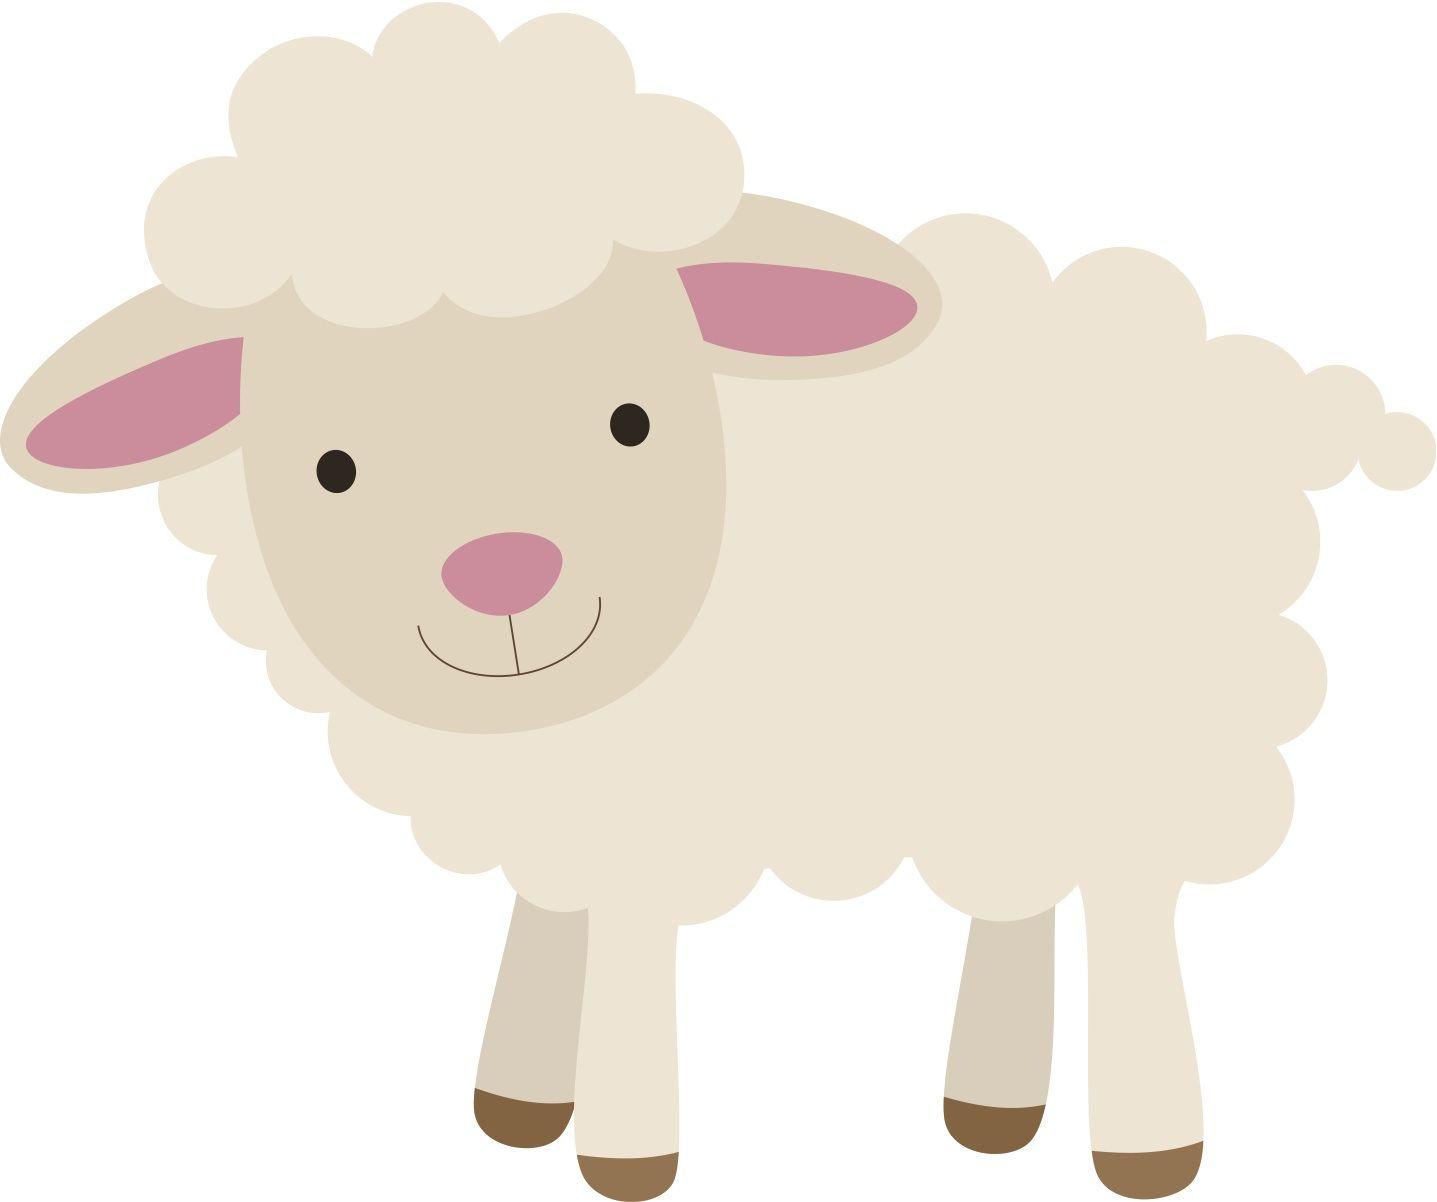 Pin By Liz Richter On Saint Francis Mural Lamb Drawing Sheep Drawing Cute Lamb